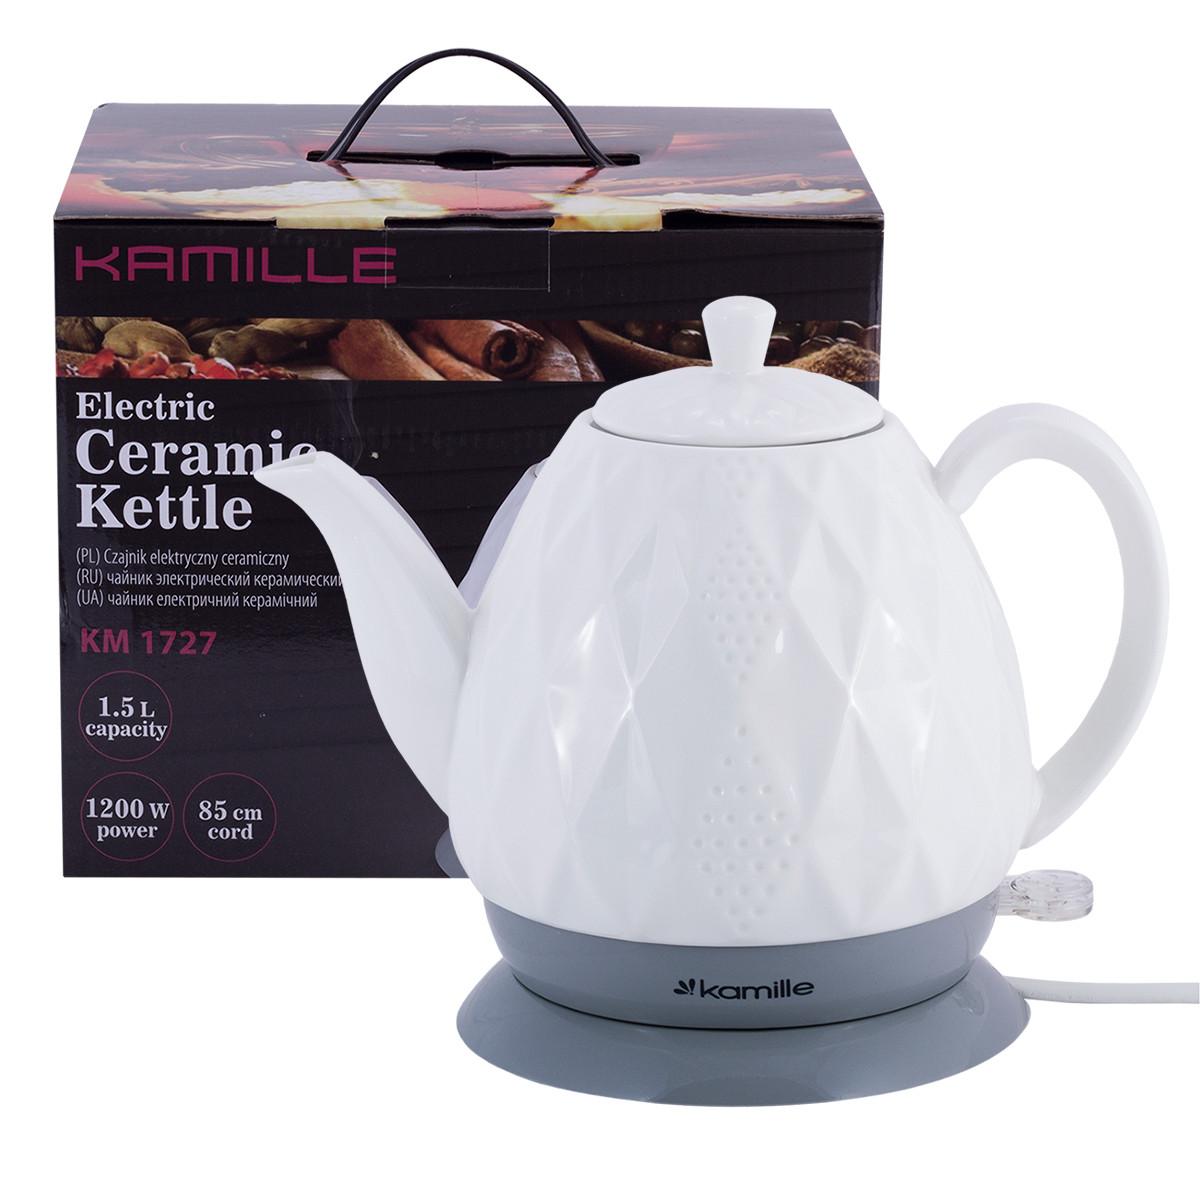 Чайник белый электрический из керамики 1.5 л.